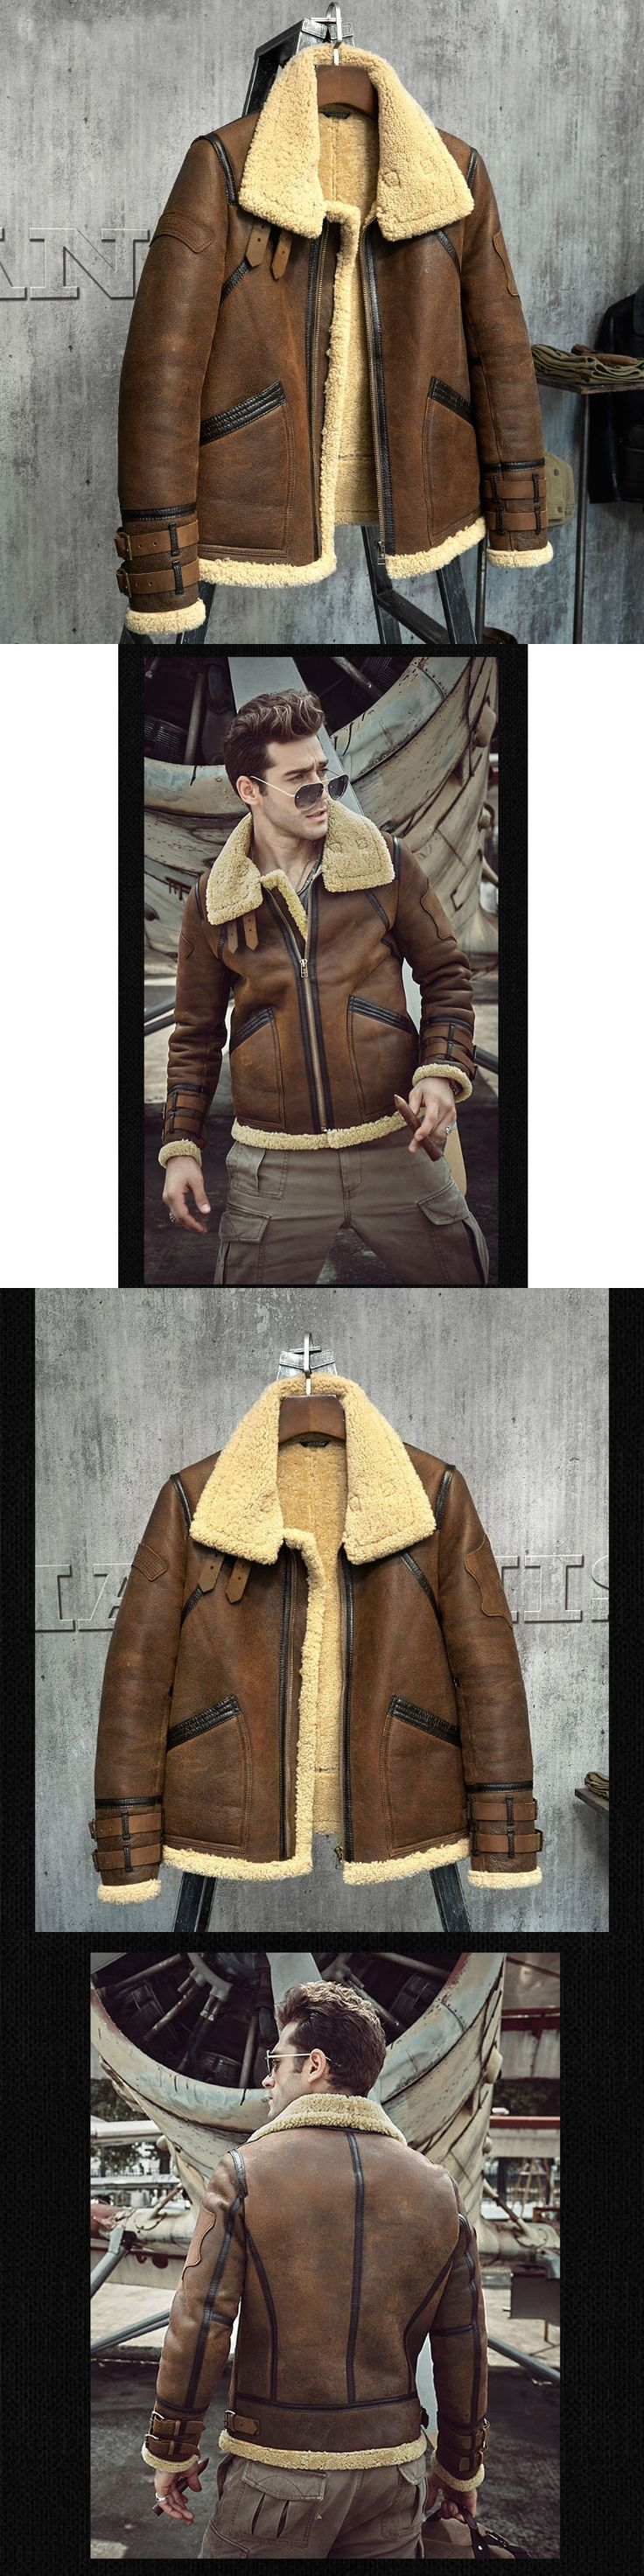 Fur Coat Men's Shearling Jacket B3 Flight Jacket Short Fur Leather Jacket Imported Wool From Australia Men's Sheepskin Aviator P